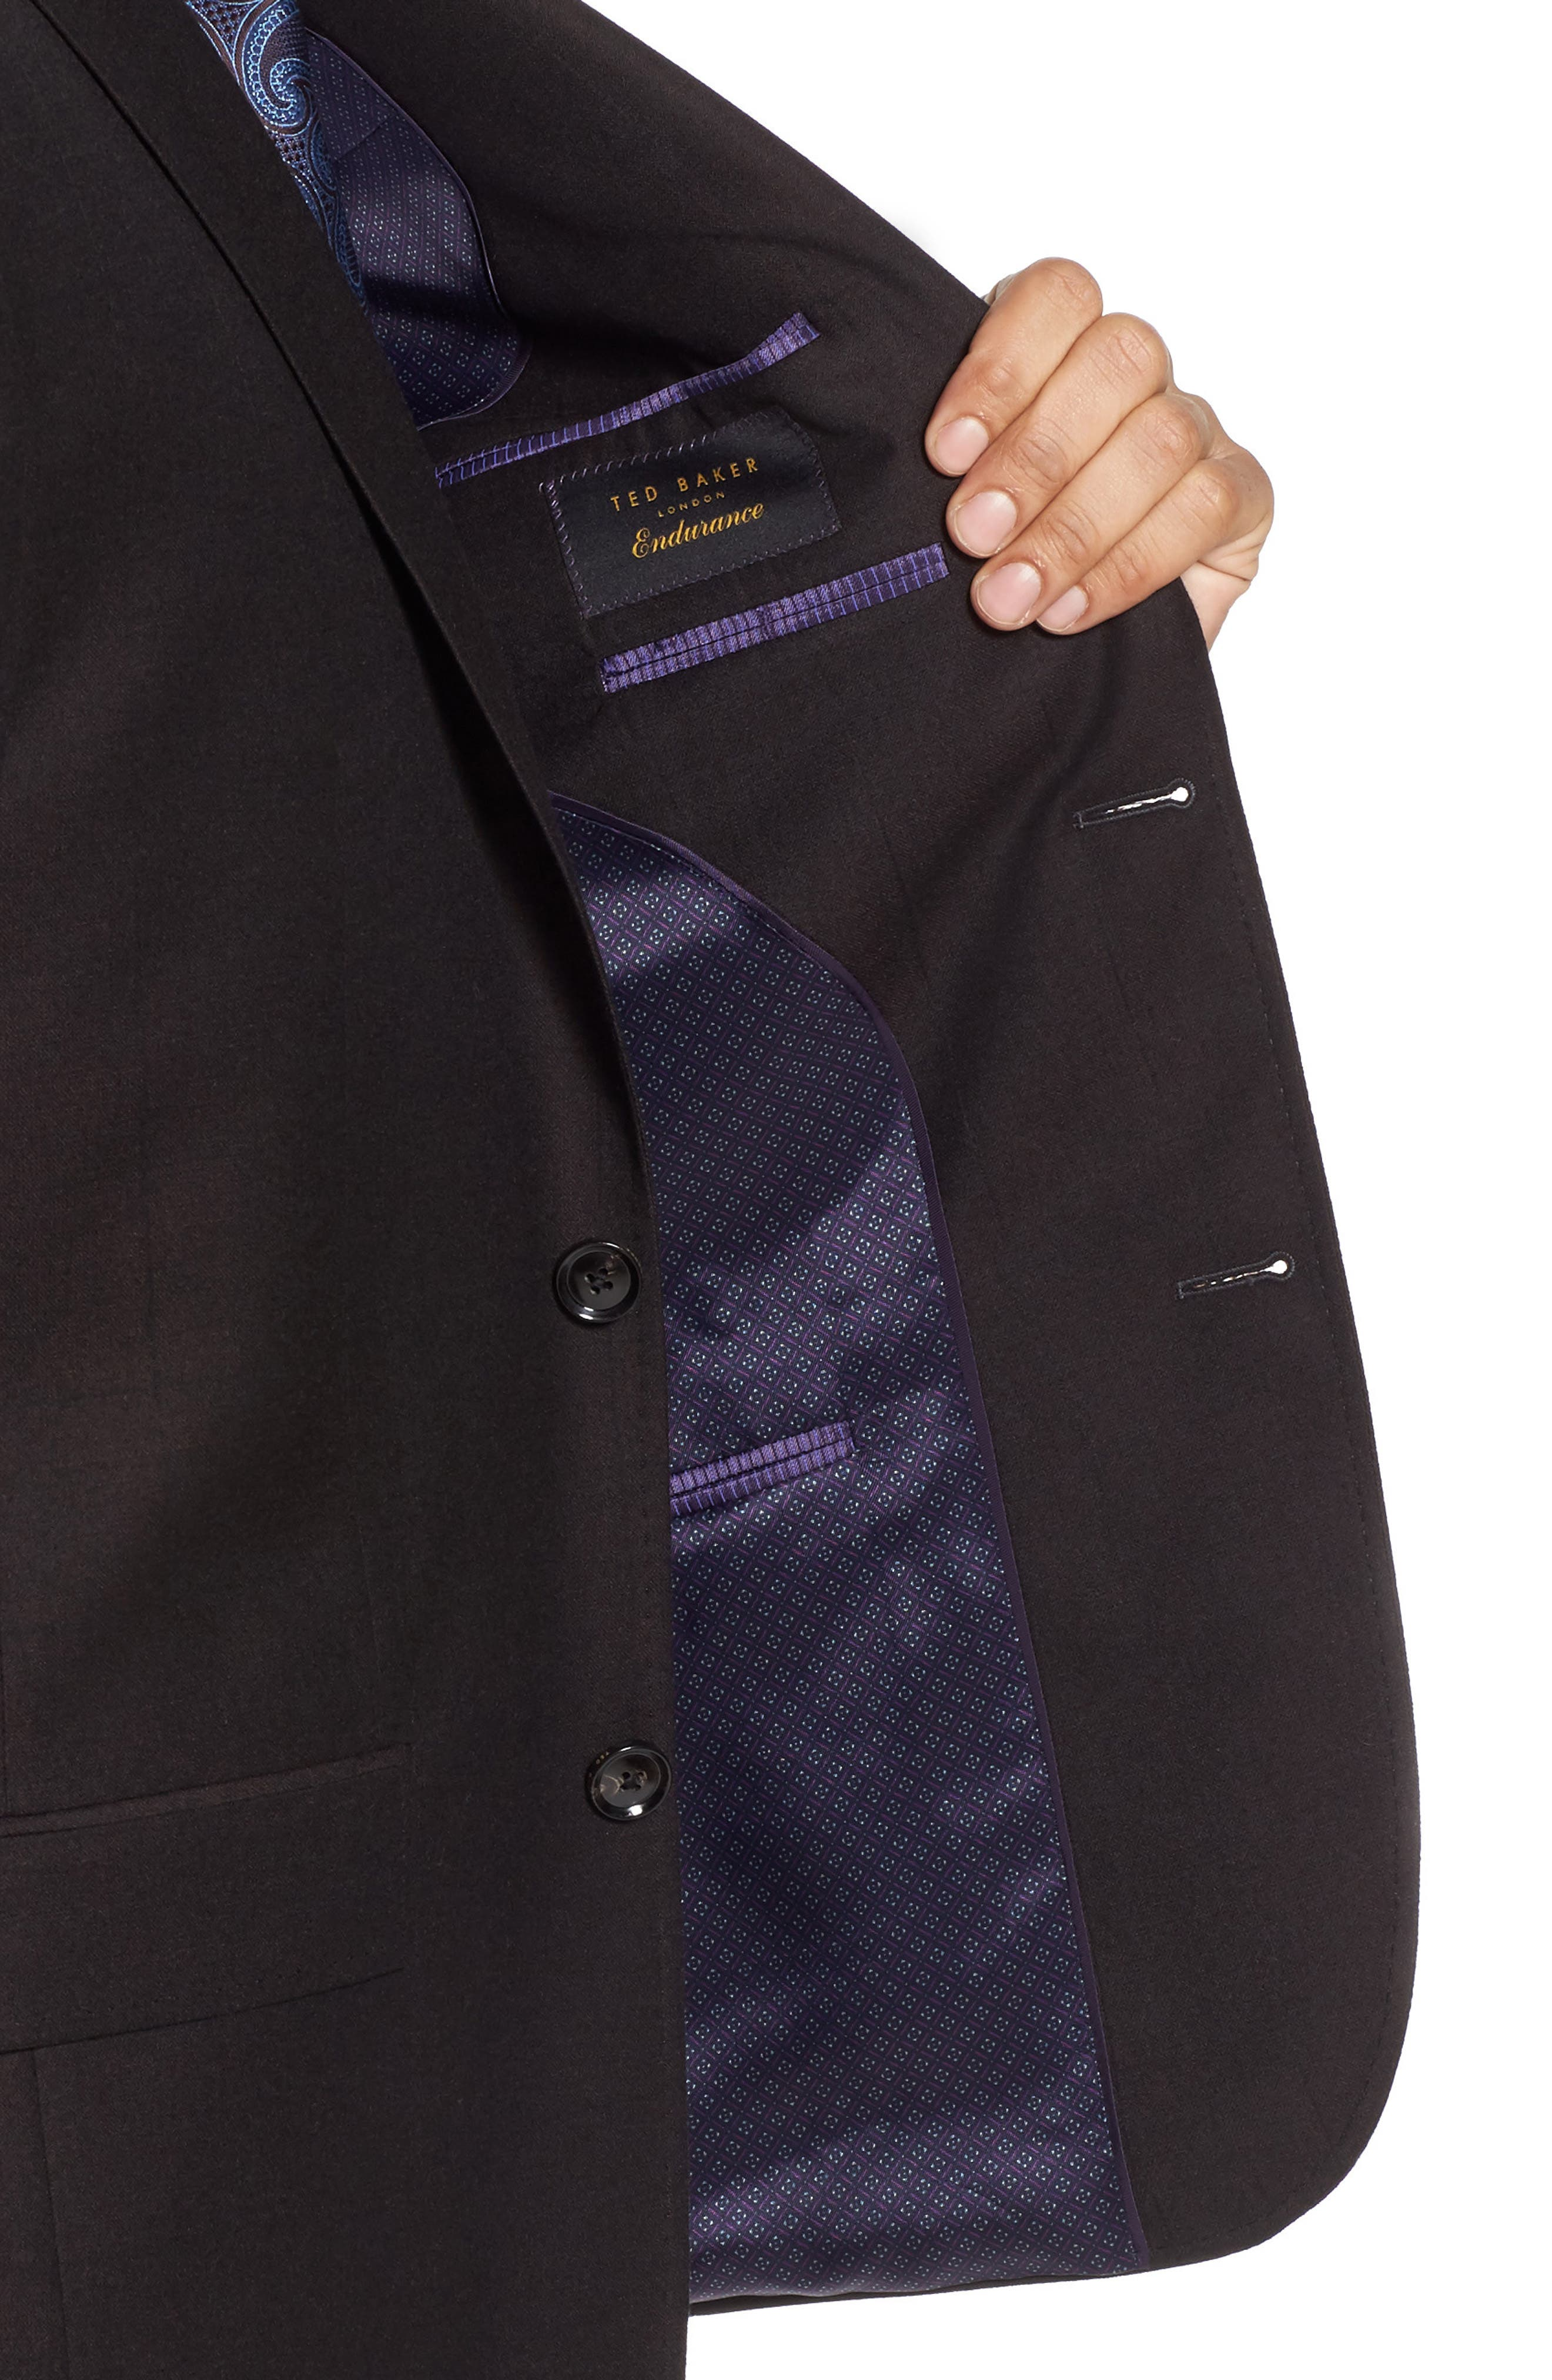 Jay Trim Fit Solid Wool Suit,                             Alternate thumbnail 4, color,                             200